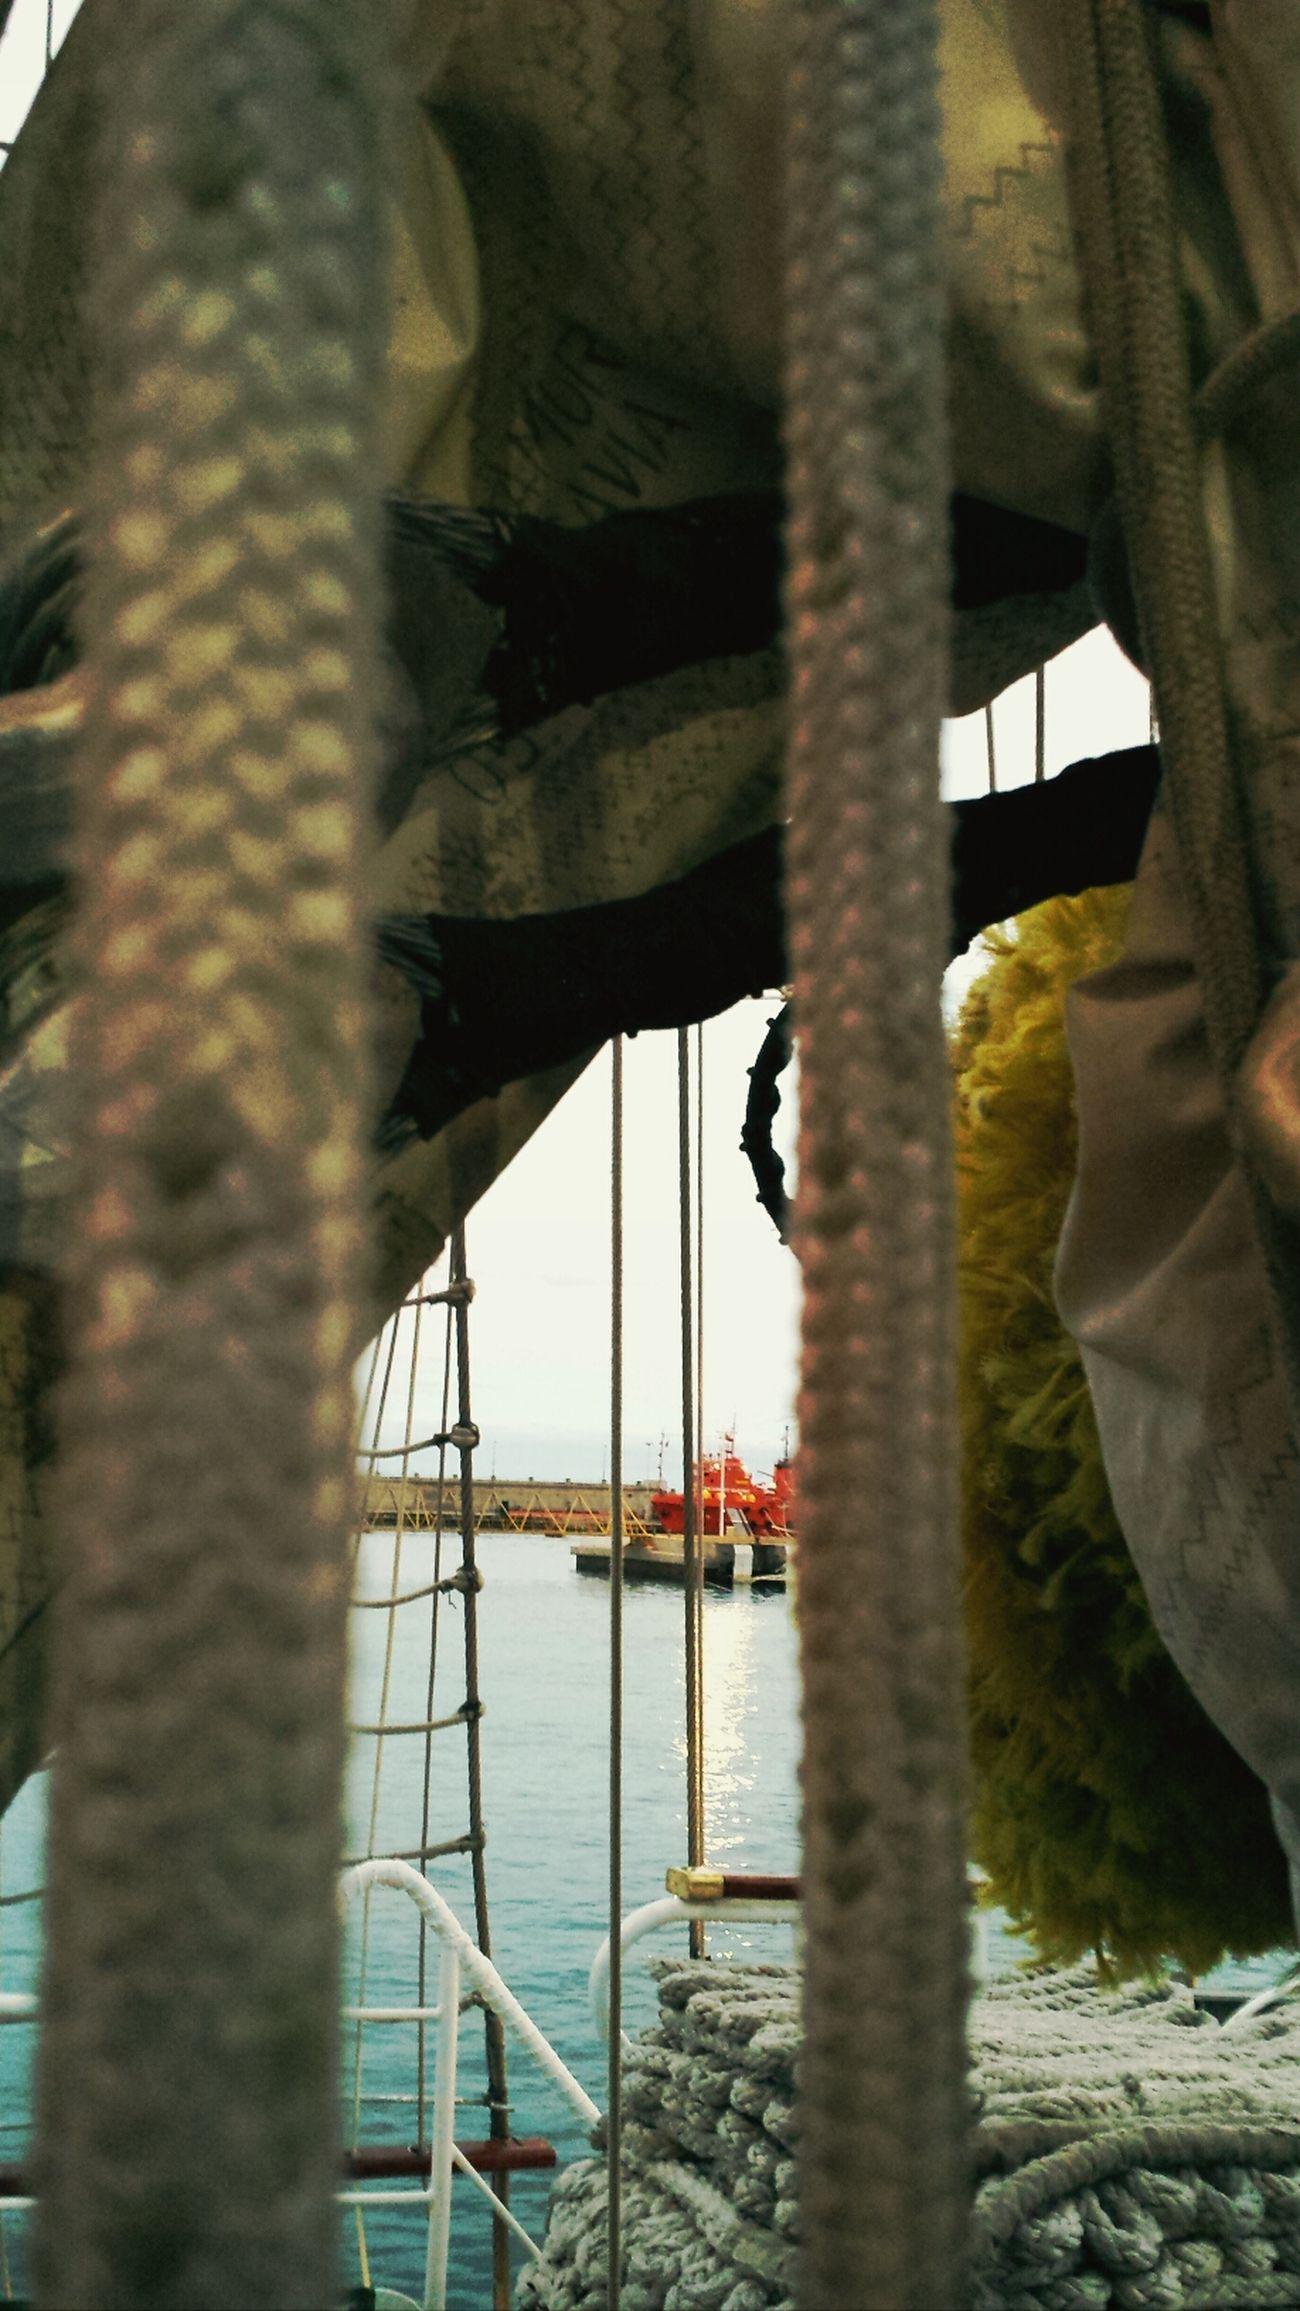 Puertos Barcos Cuerdas Relaxing